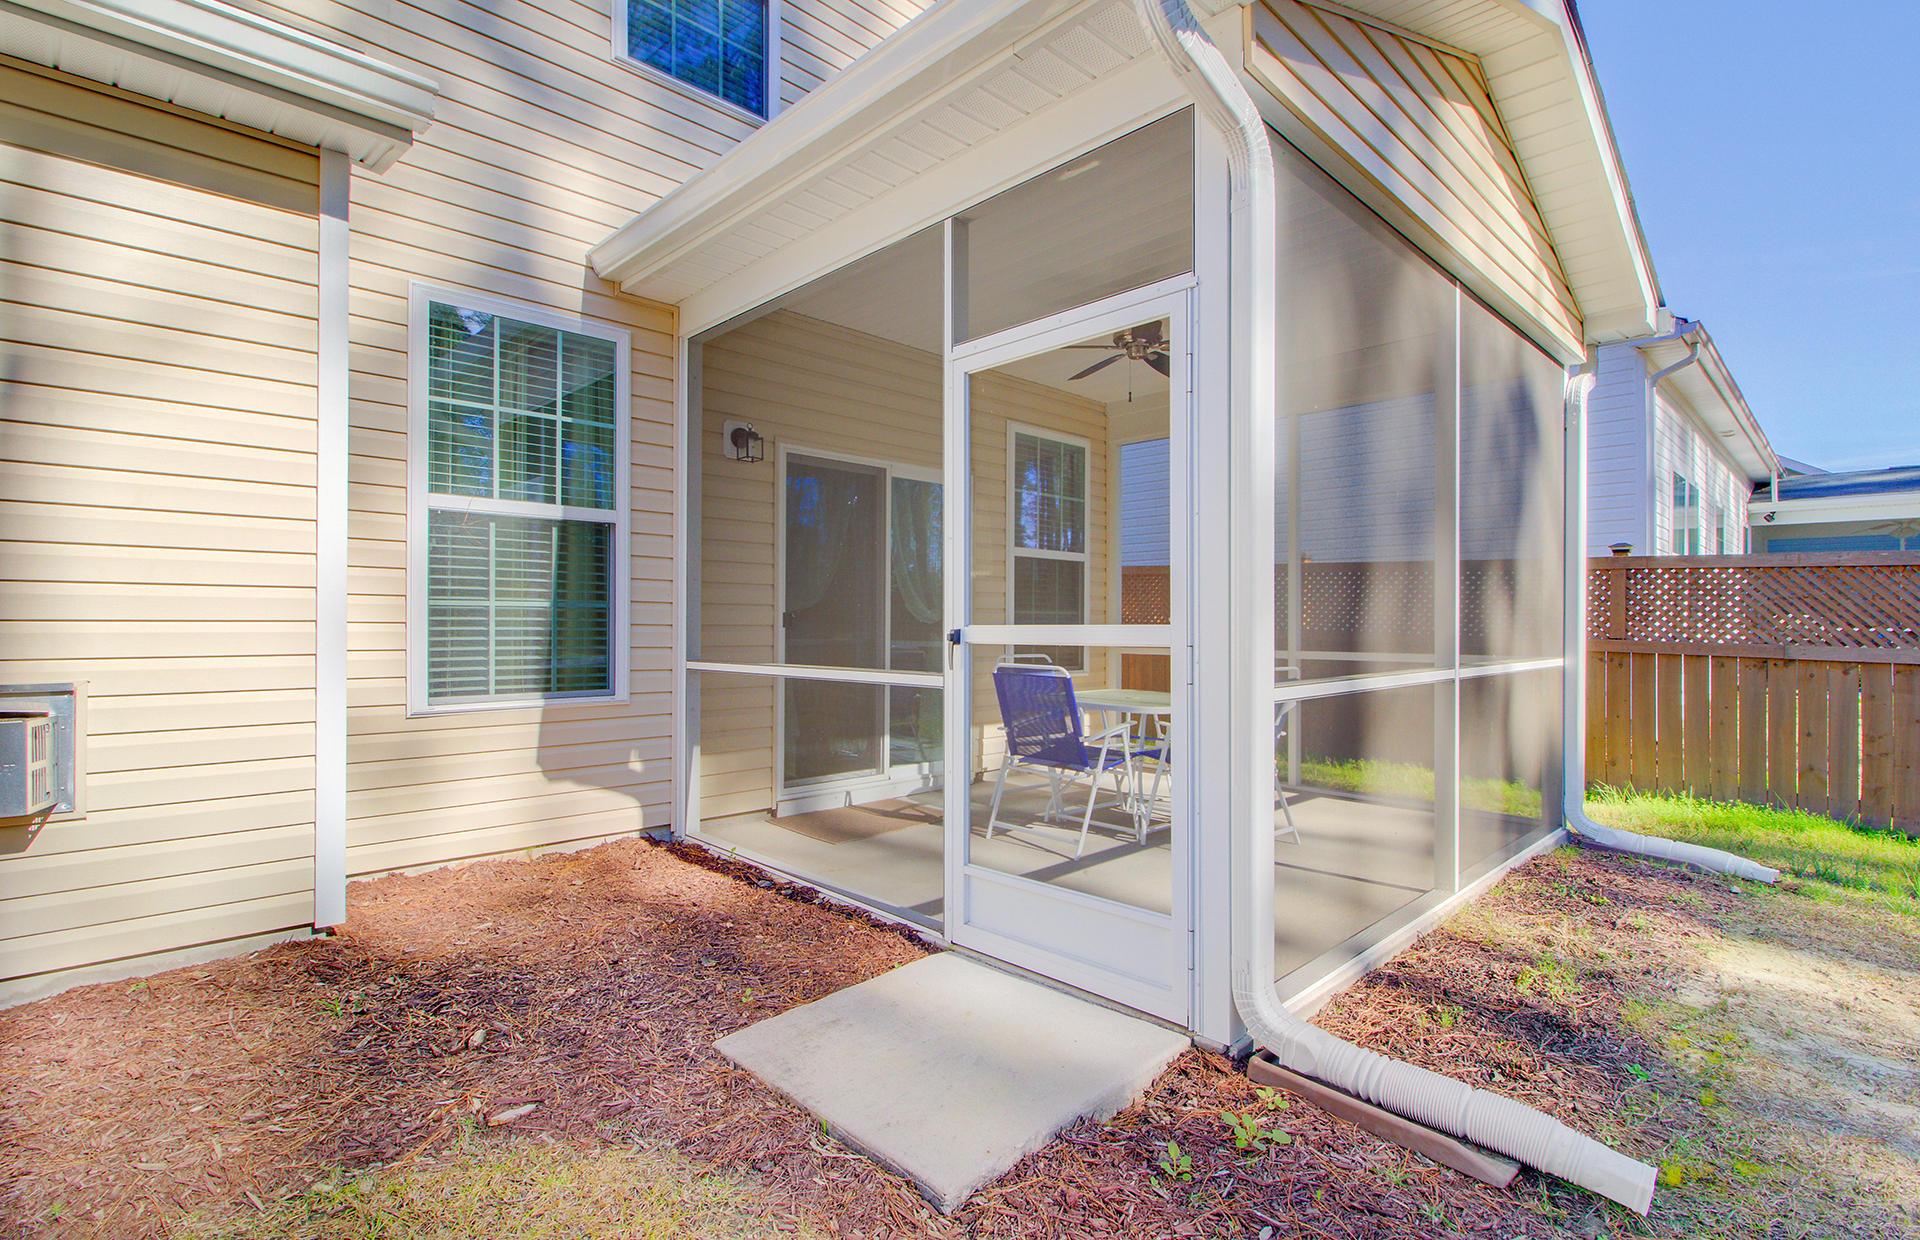 Cane Bay Plantation Homes For Sale - 255 Spectrum, Summerville, SC - 28